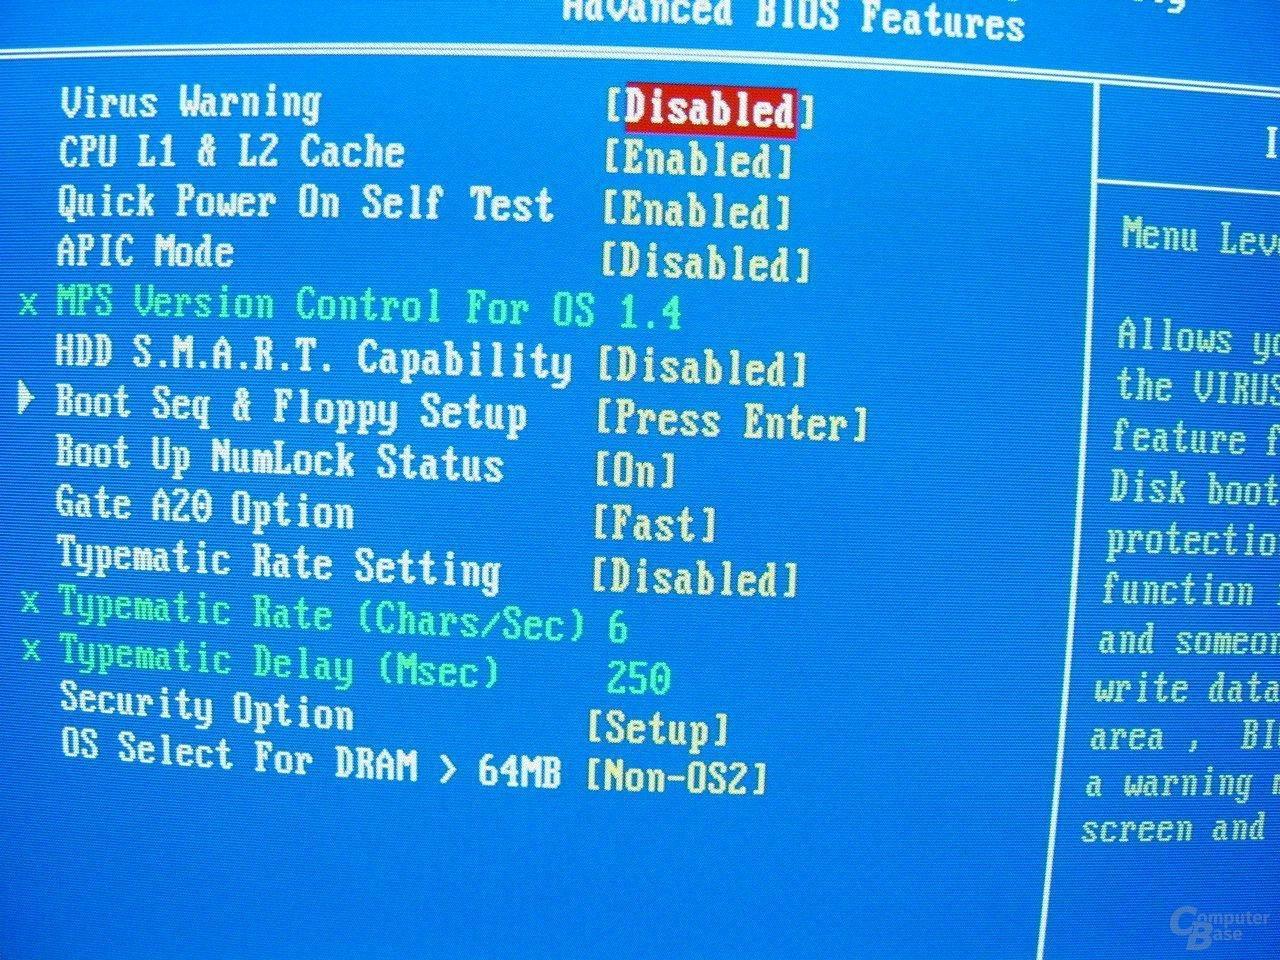 EP-4GEAEI - BIOS - Advanced